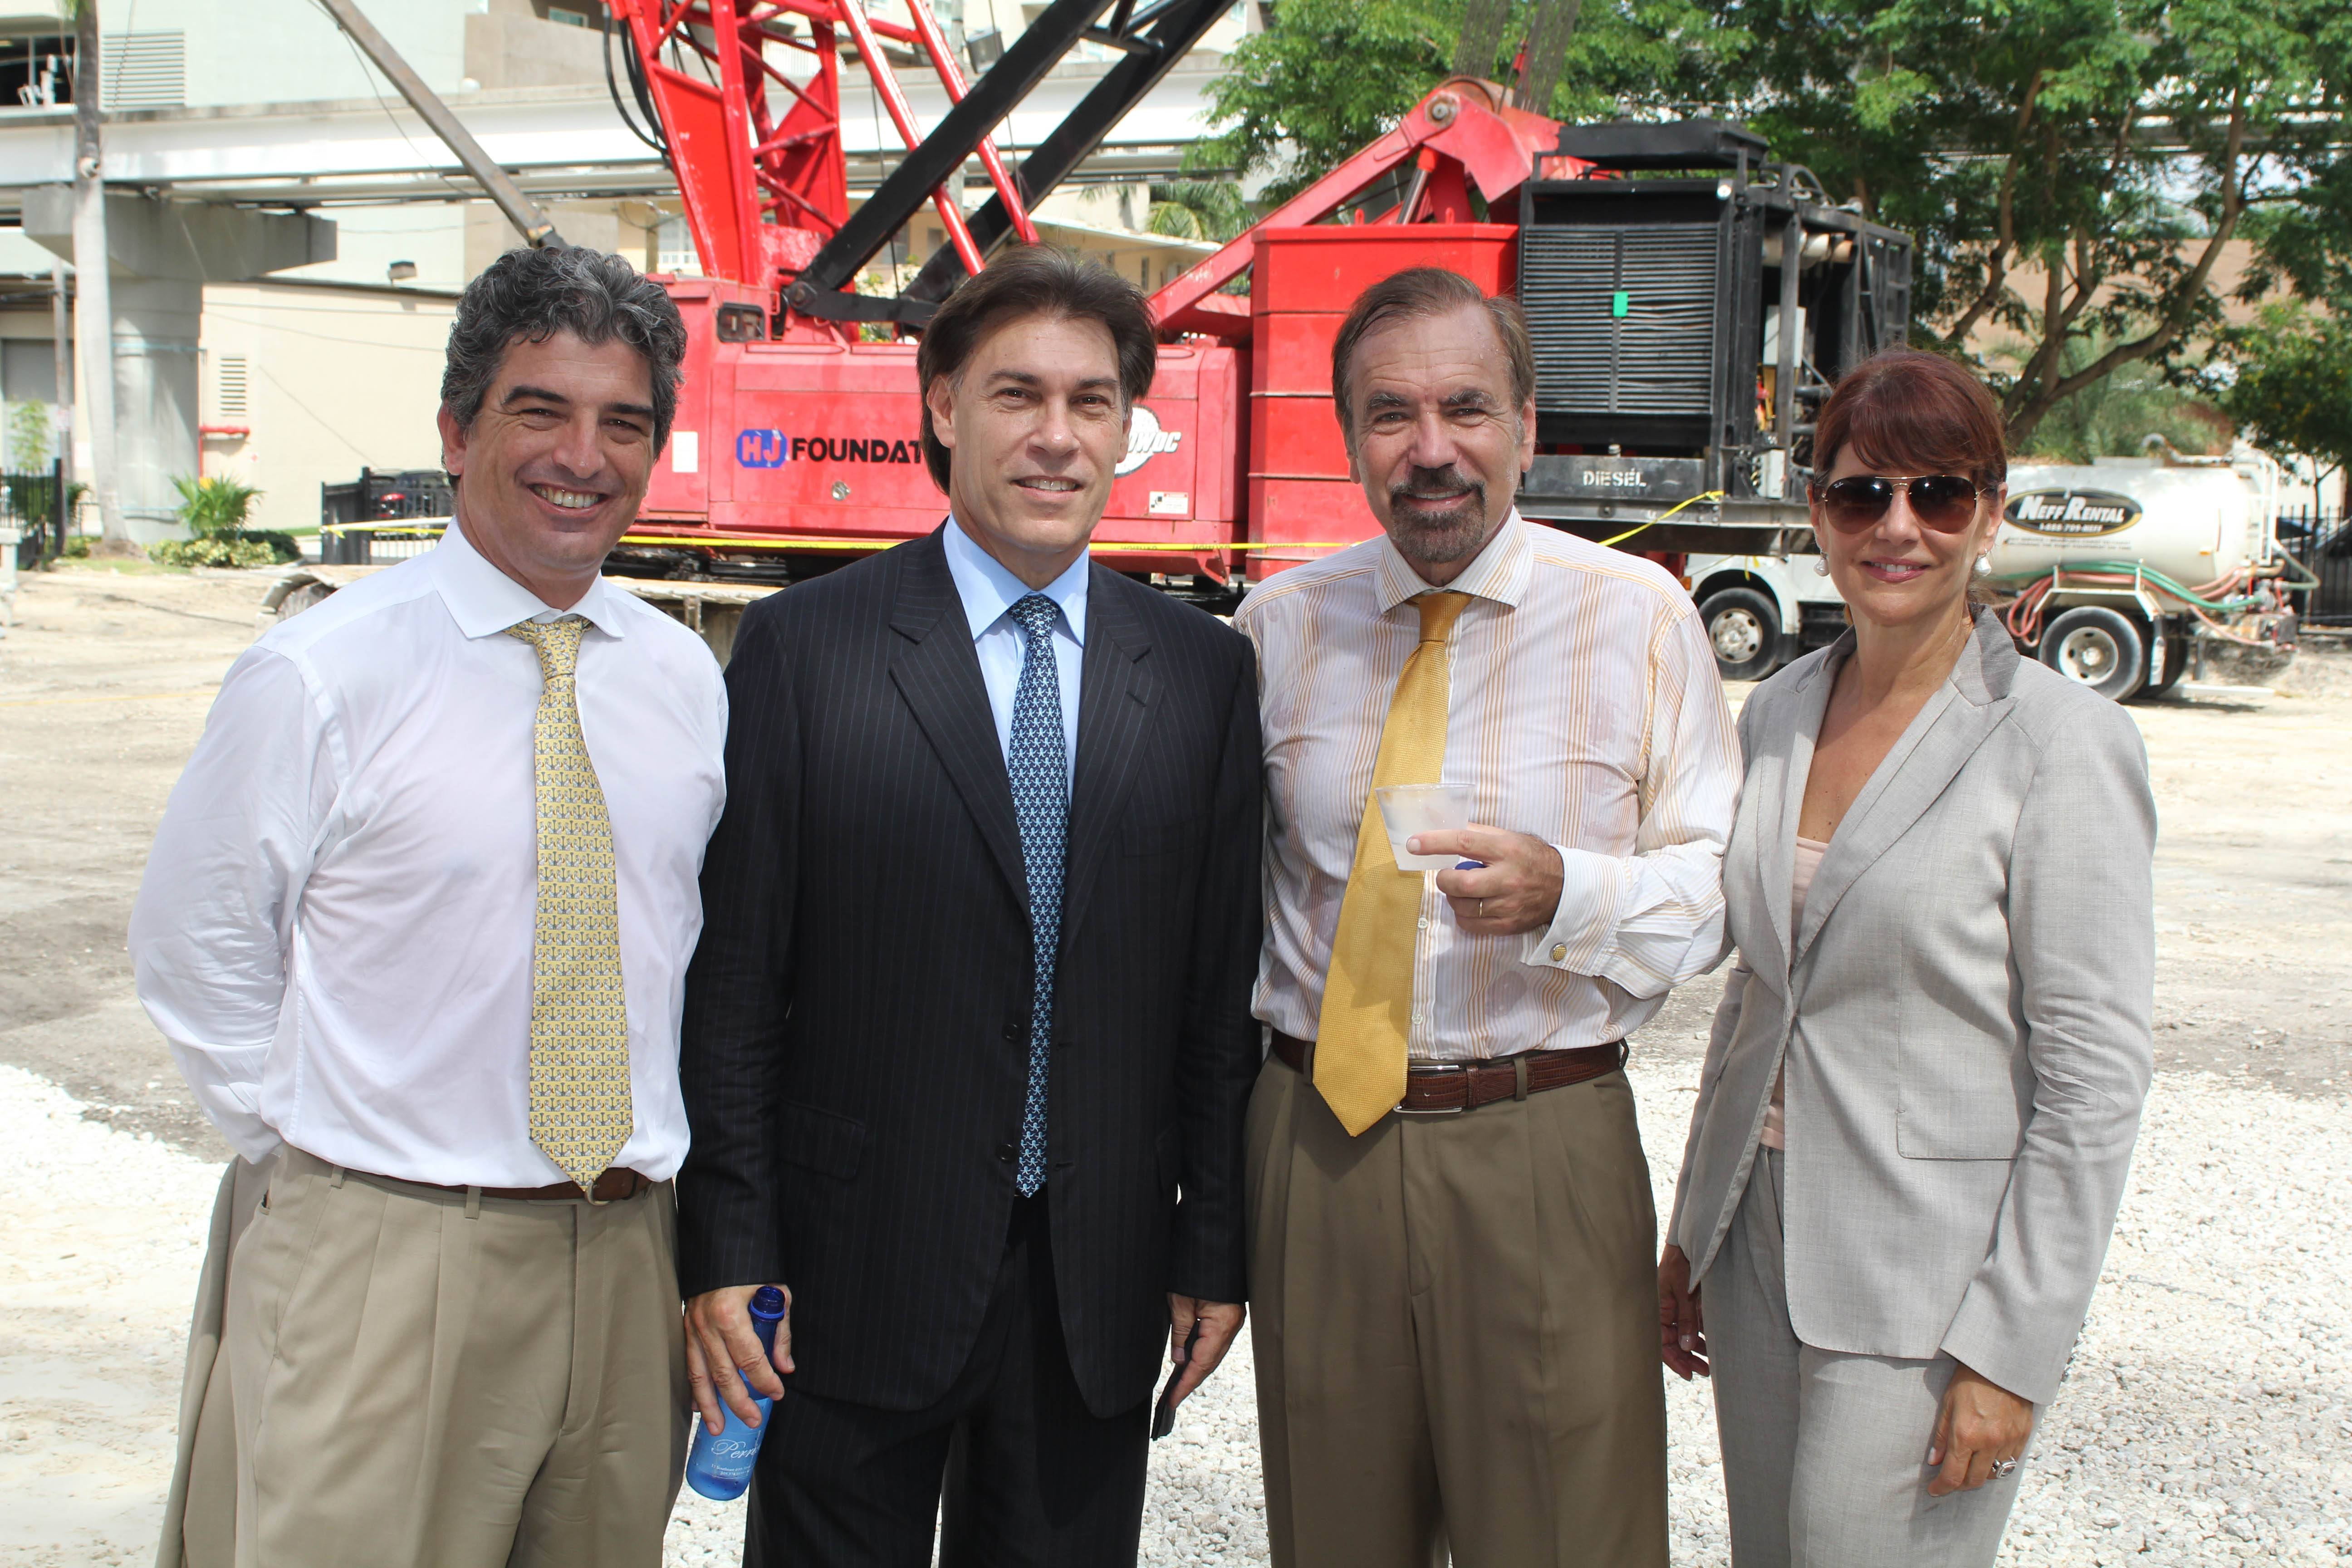 Carlos Rosso, Edgardo Defortuna, Jorge Perez, Sonia Figueroa